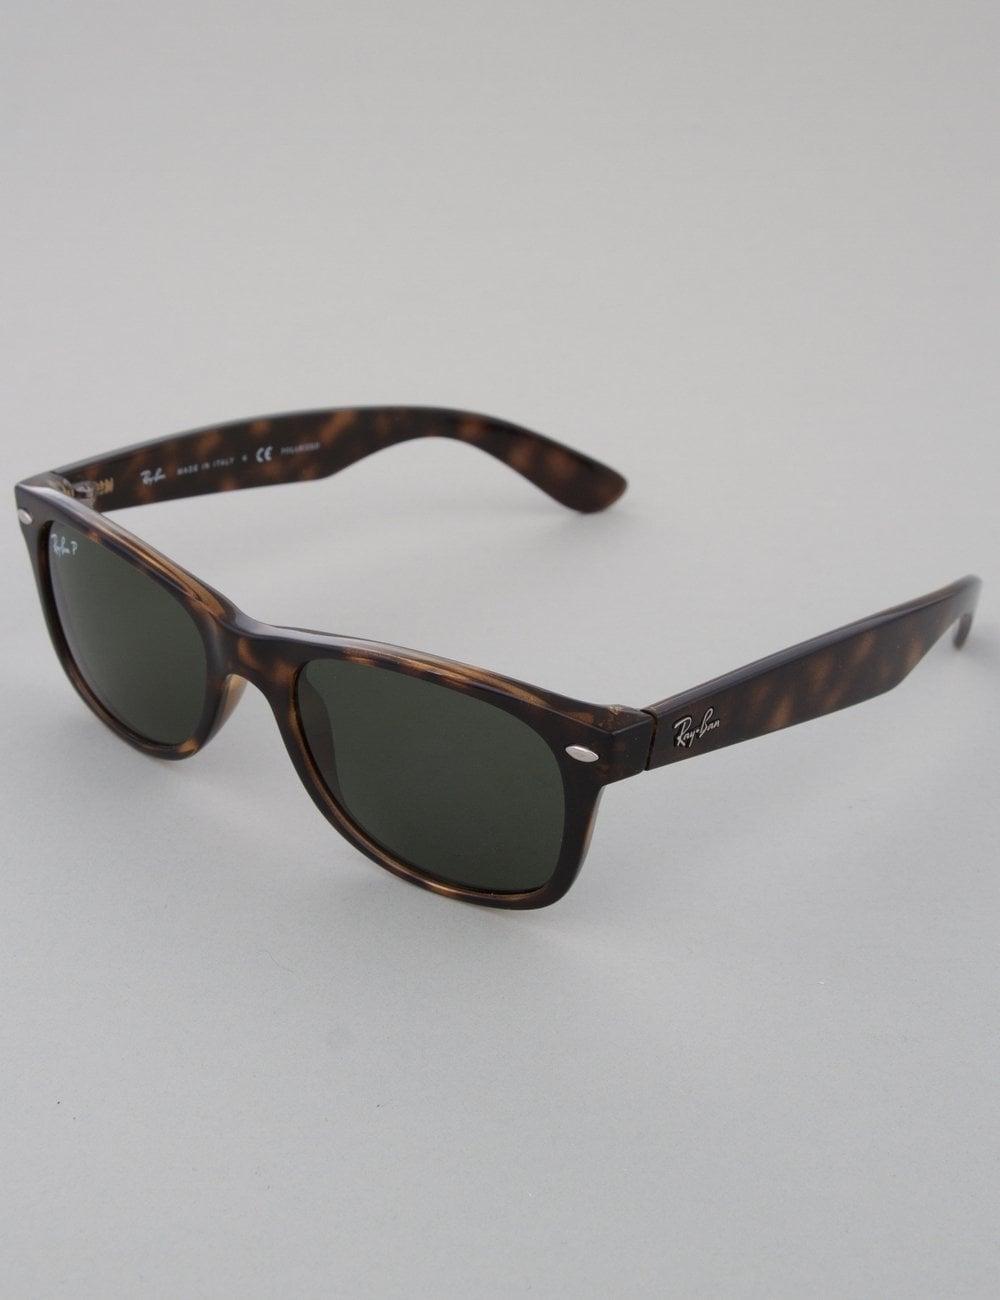 eb0ab32e9b Ray-Ban New Wayfarer Sunglasses - Tortoise    Crystal Green Polarized